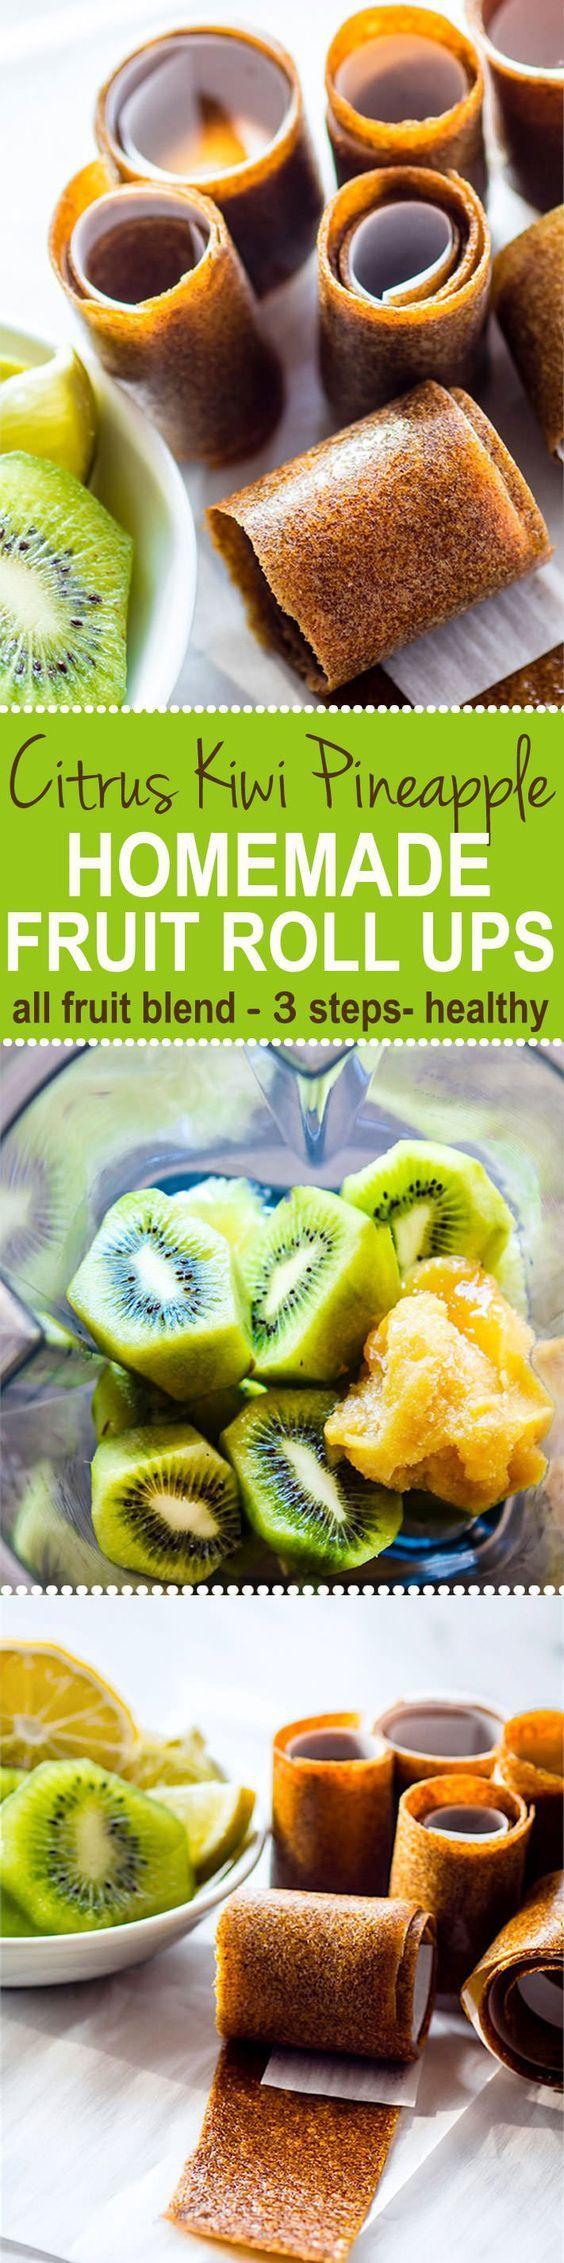 healthy fruits list homemade fruit roll ups